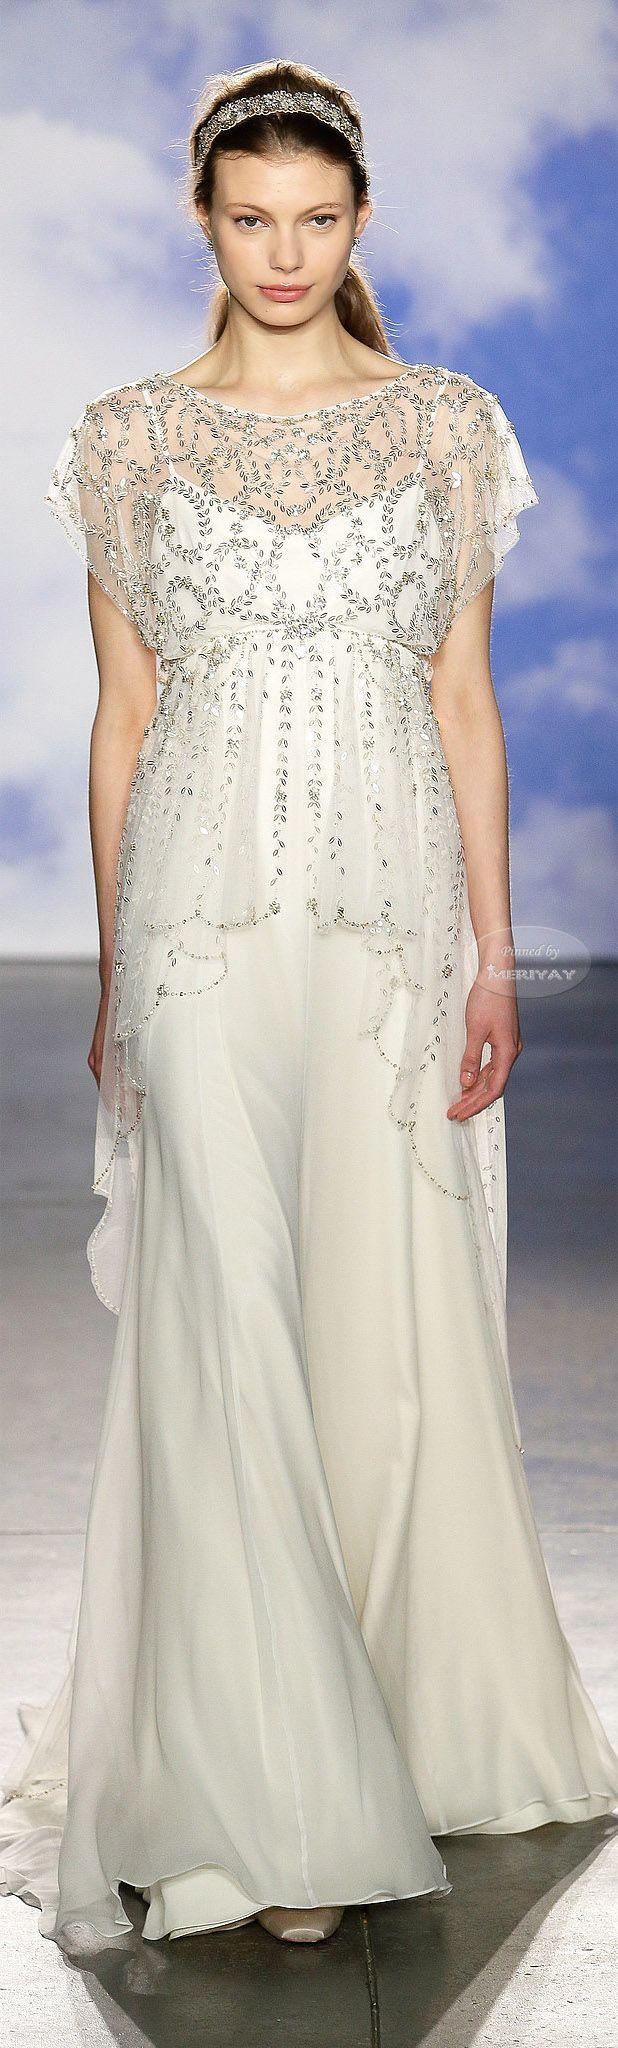 Jenny Packham Bridal Spring 2015. For a gorgeous Regency themed wedding, I'd think.